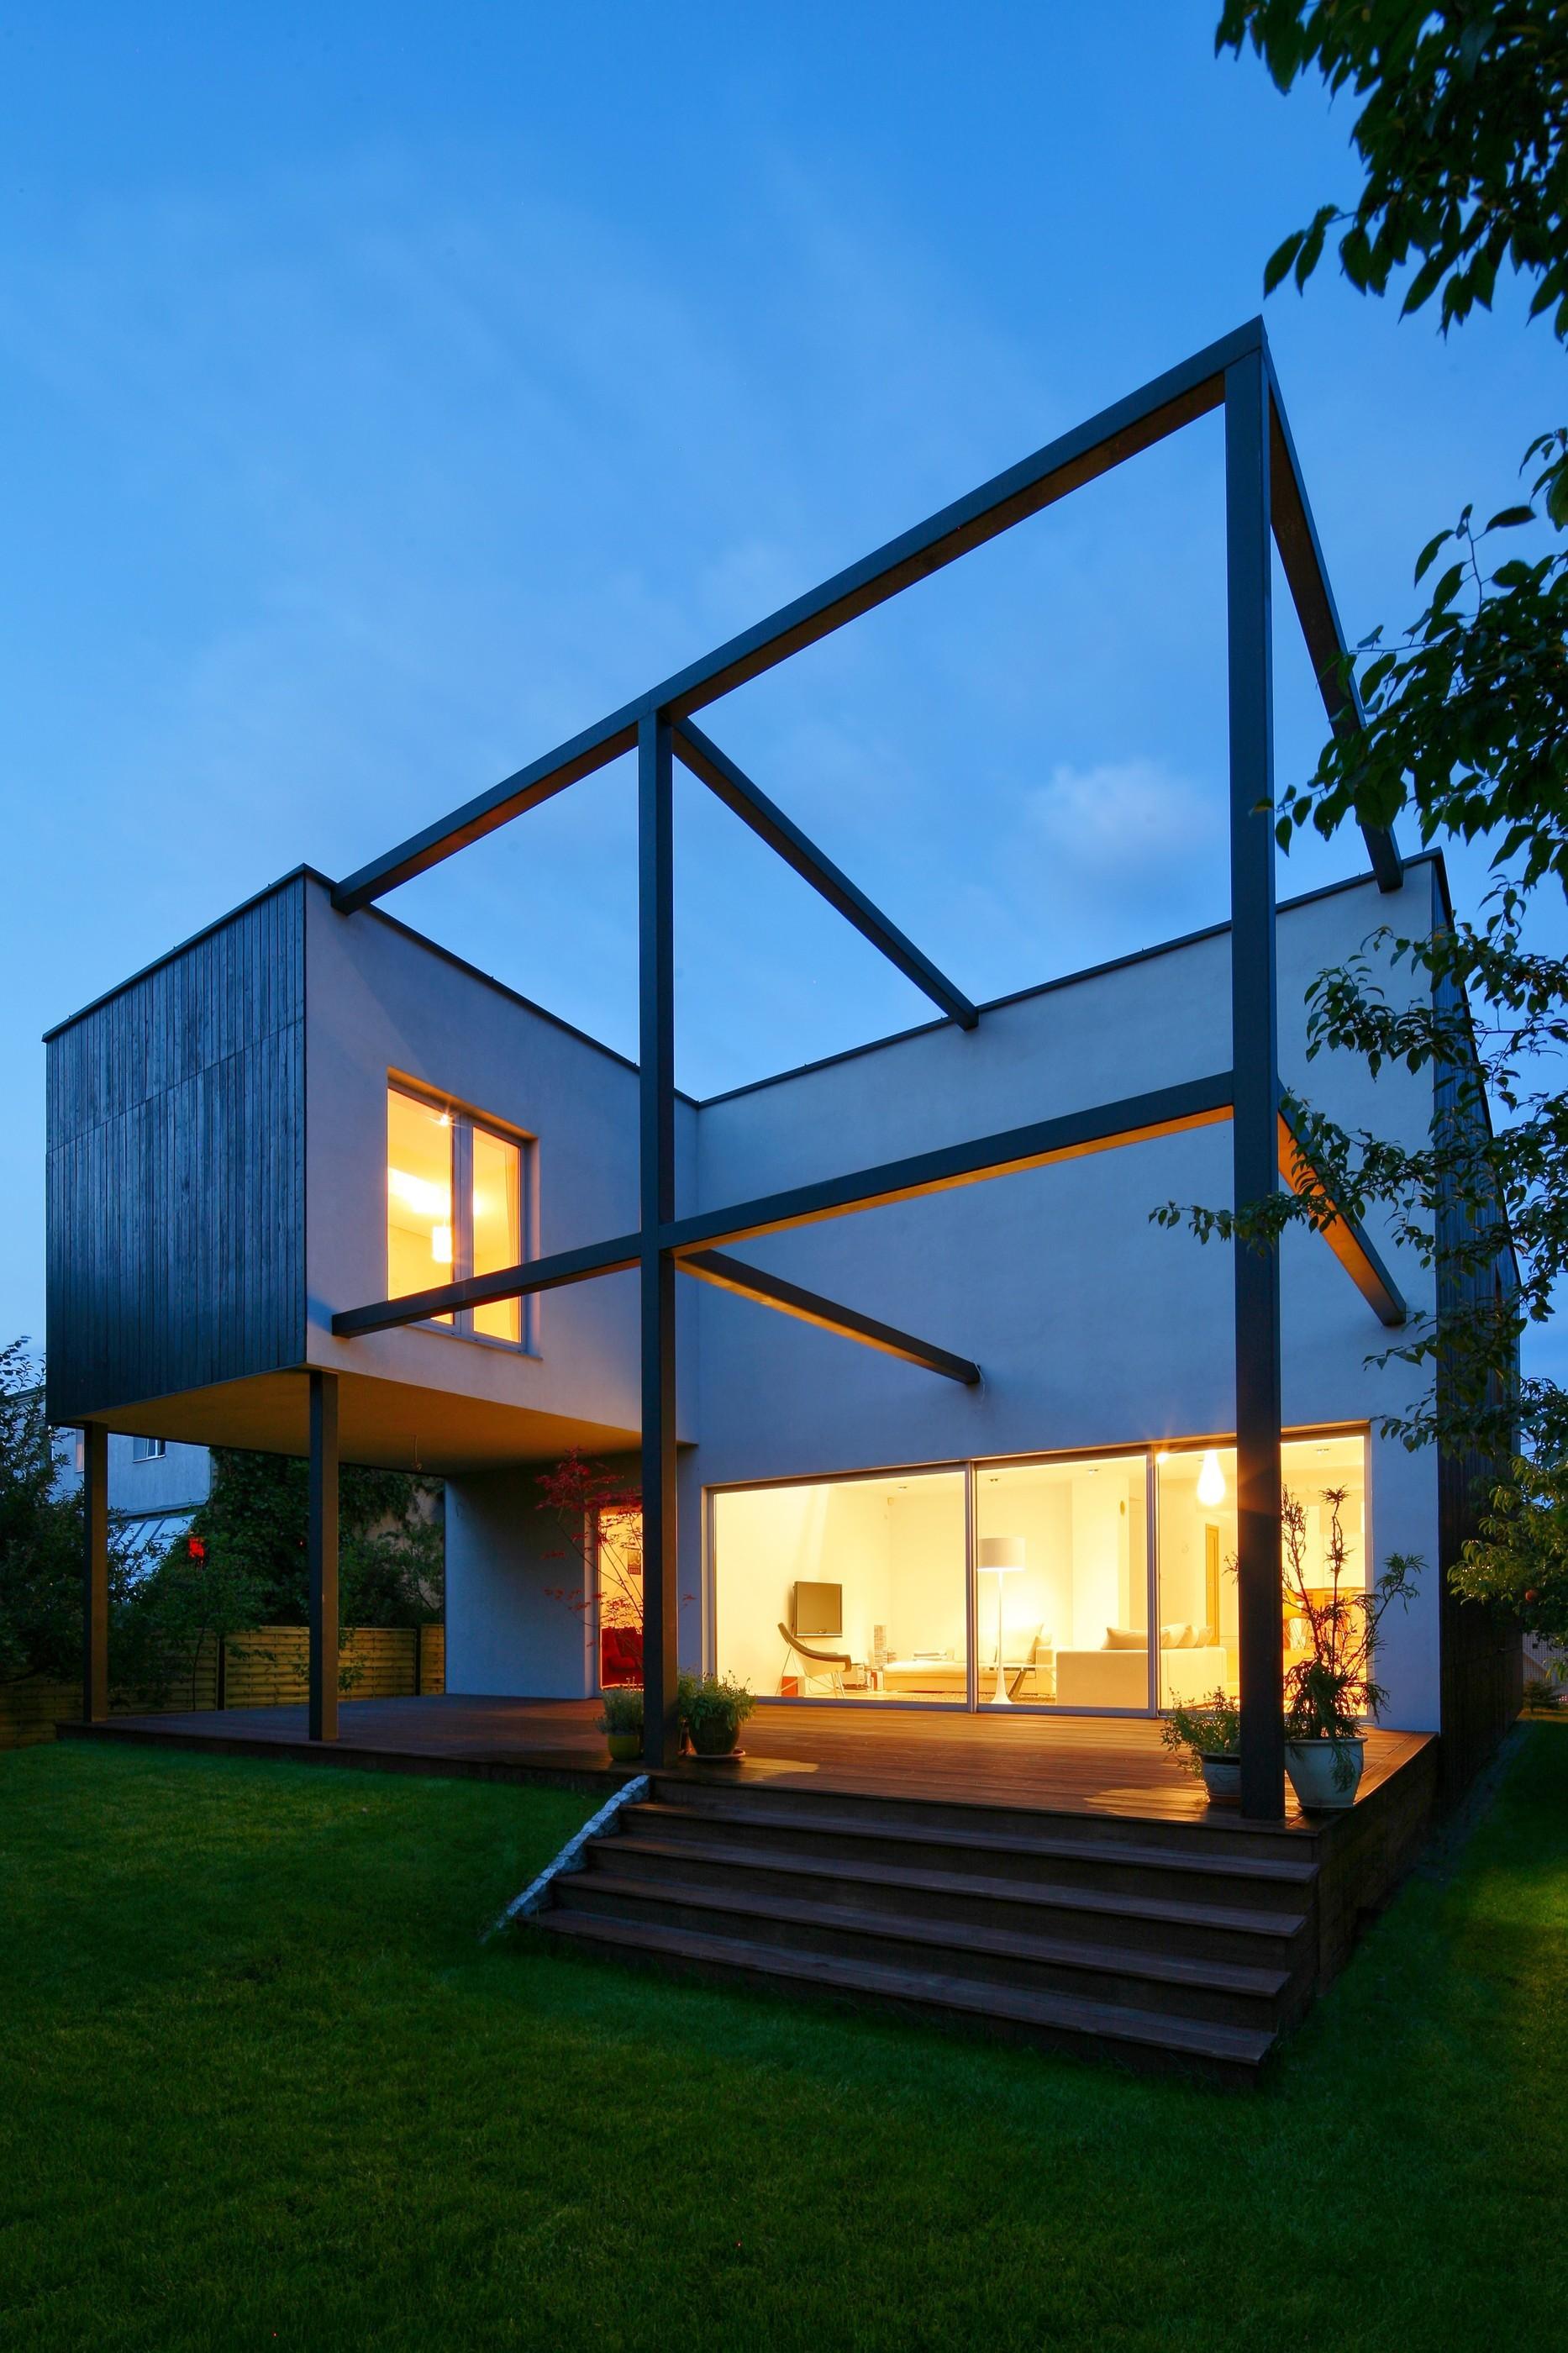 Black Cube House Kameleonlab - 8